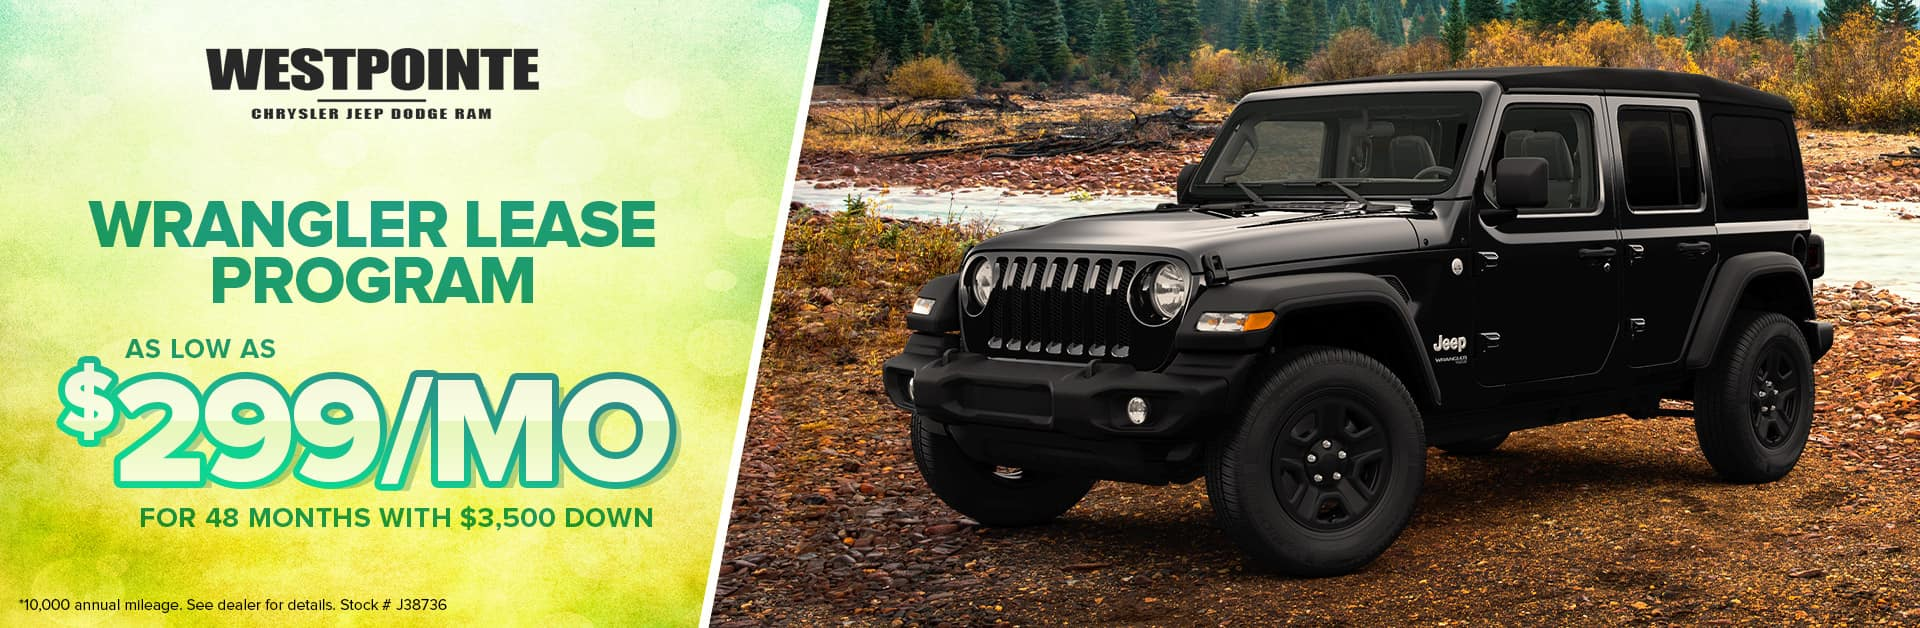 Wrangler Lease Program - Westpointe Chrysler Jeep Dodge Ram